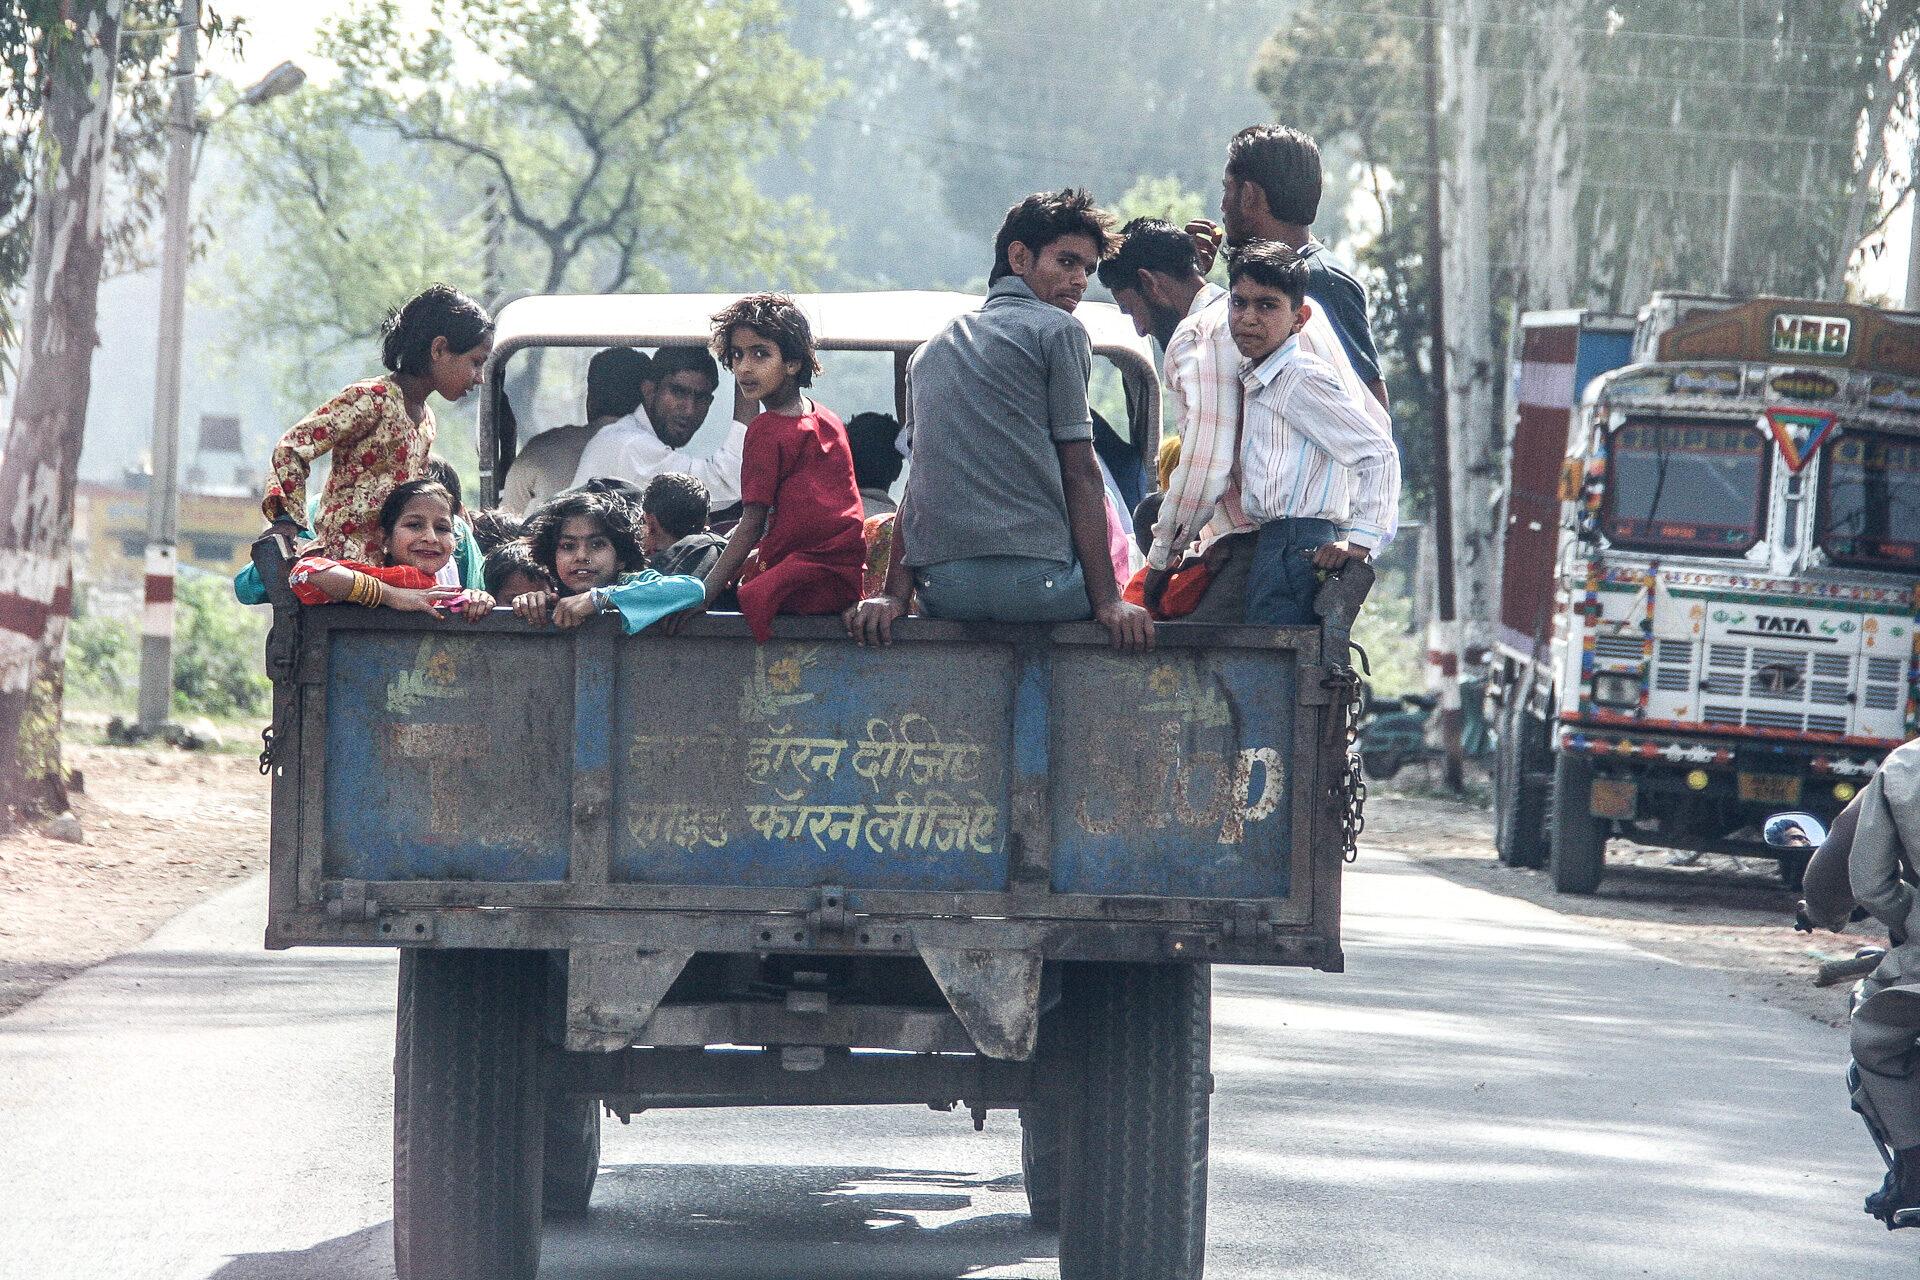 Laster in Indien